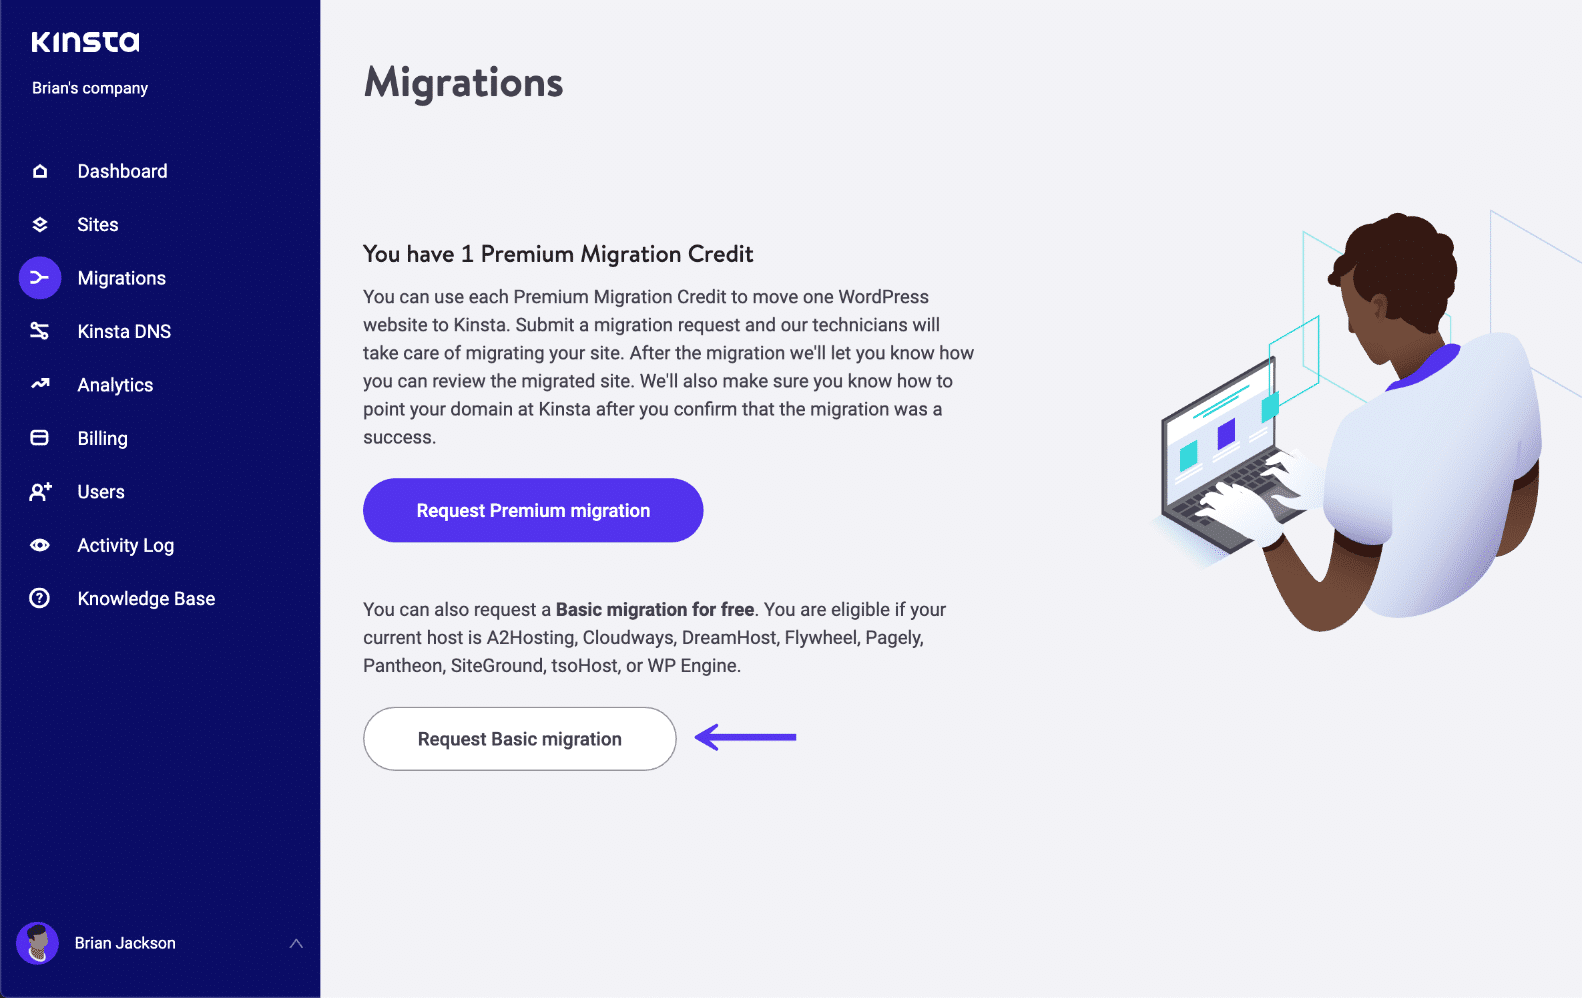 Migrazioni base in MyKinsta